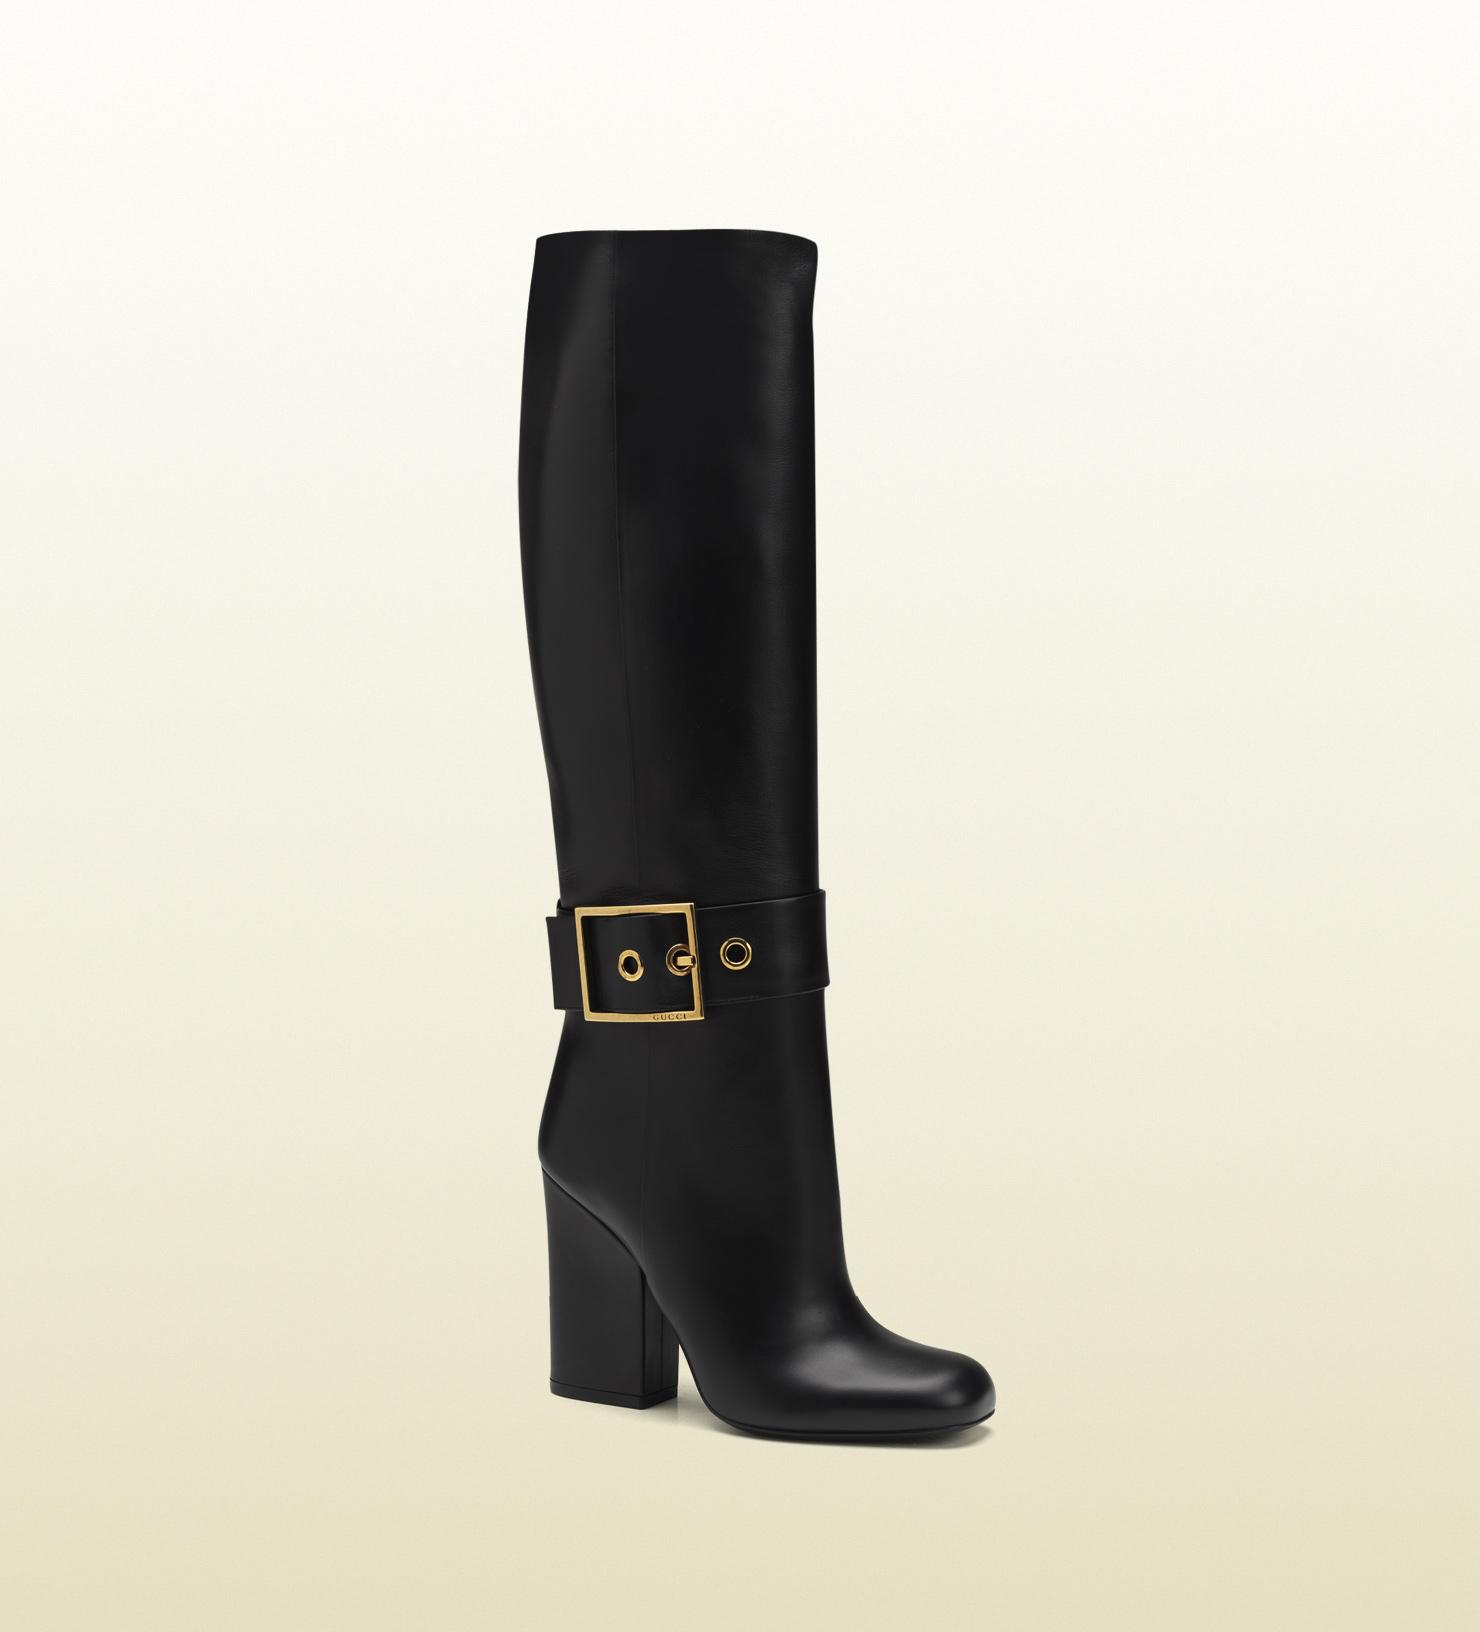 807c5a4749 Gucci Kesha Black Leather High Heel Boot in Black - Lyst